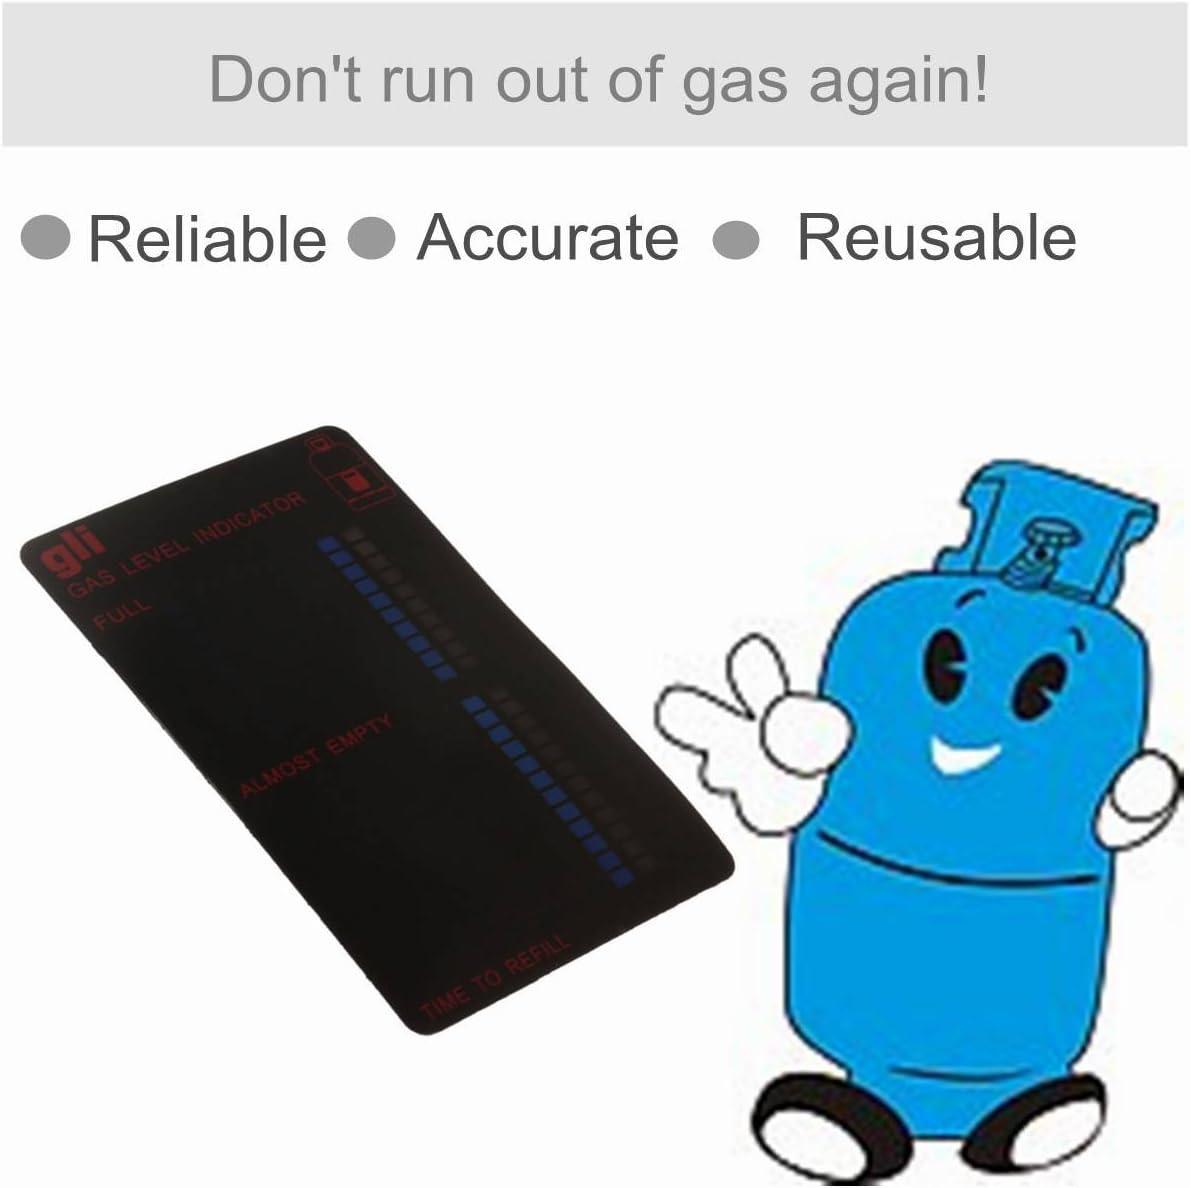 King Do Way Magnetic Gas Level Indicator Termómetro para gas camping gas indicador del estado de botellas de gas gas fuellstand Level Indicator ...